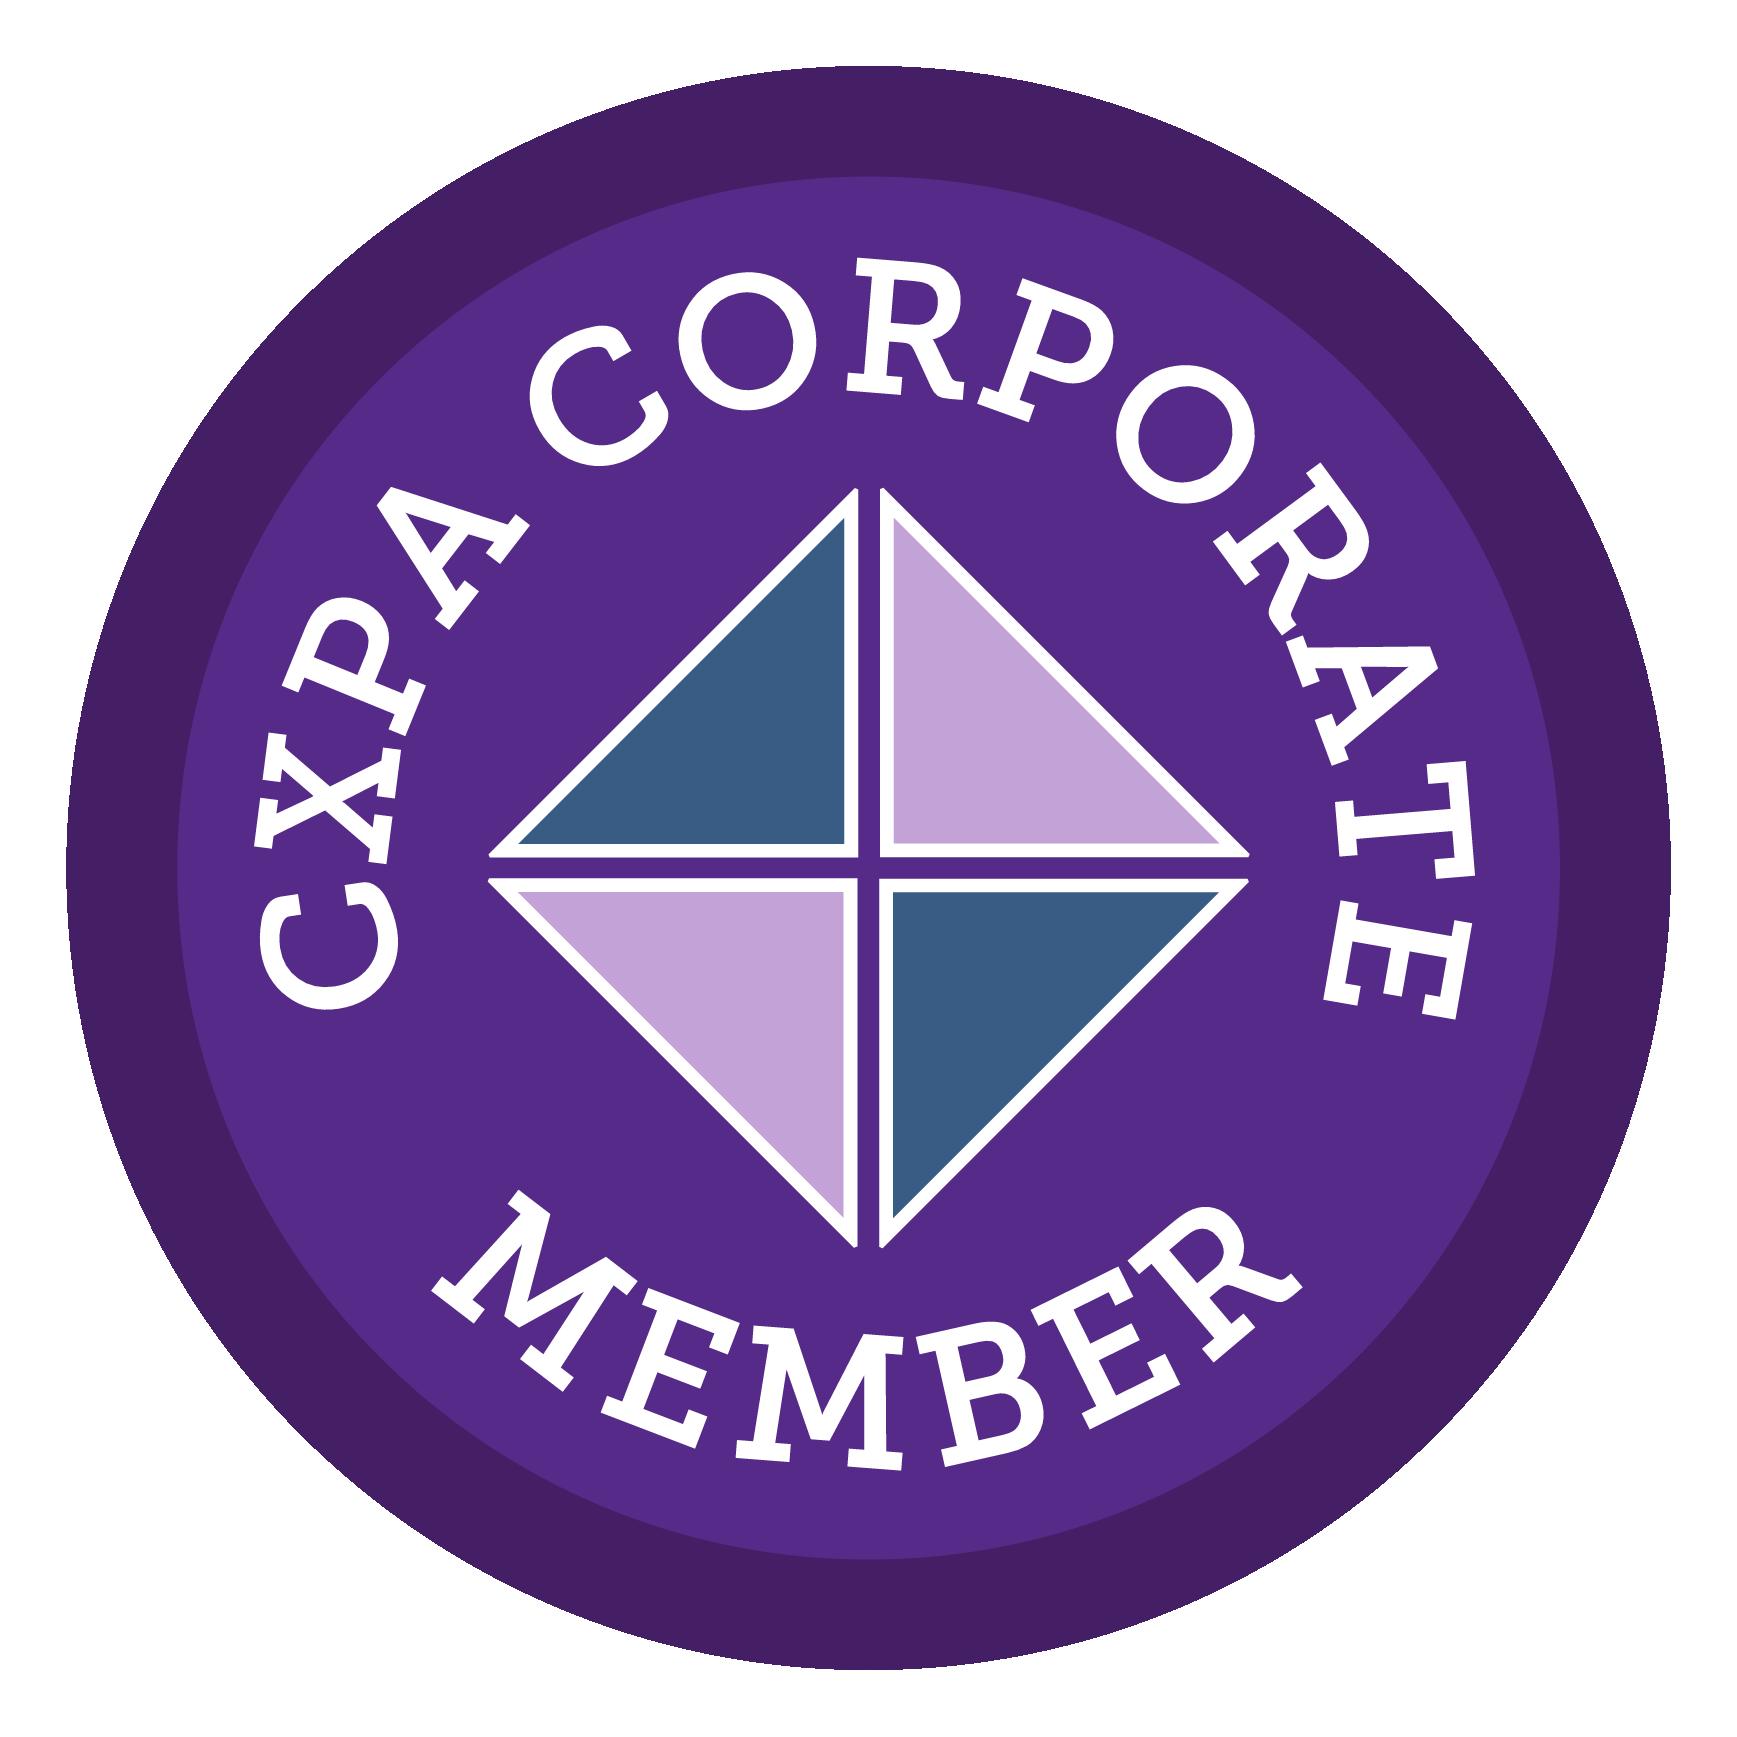 CXPA Corporate Member - Sapphire Logo